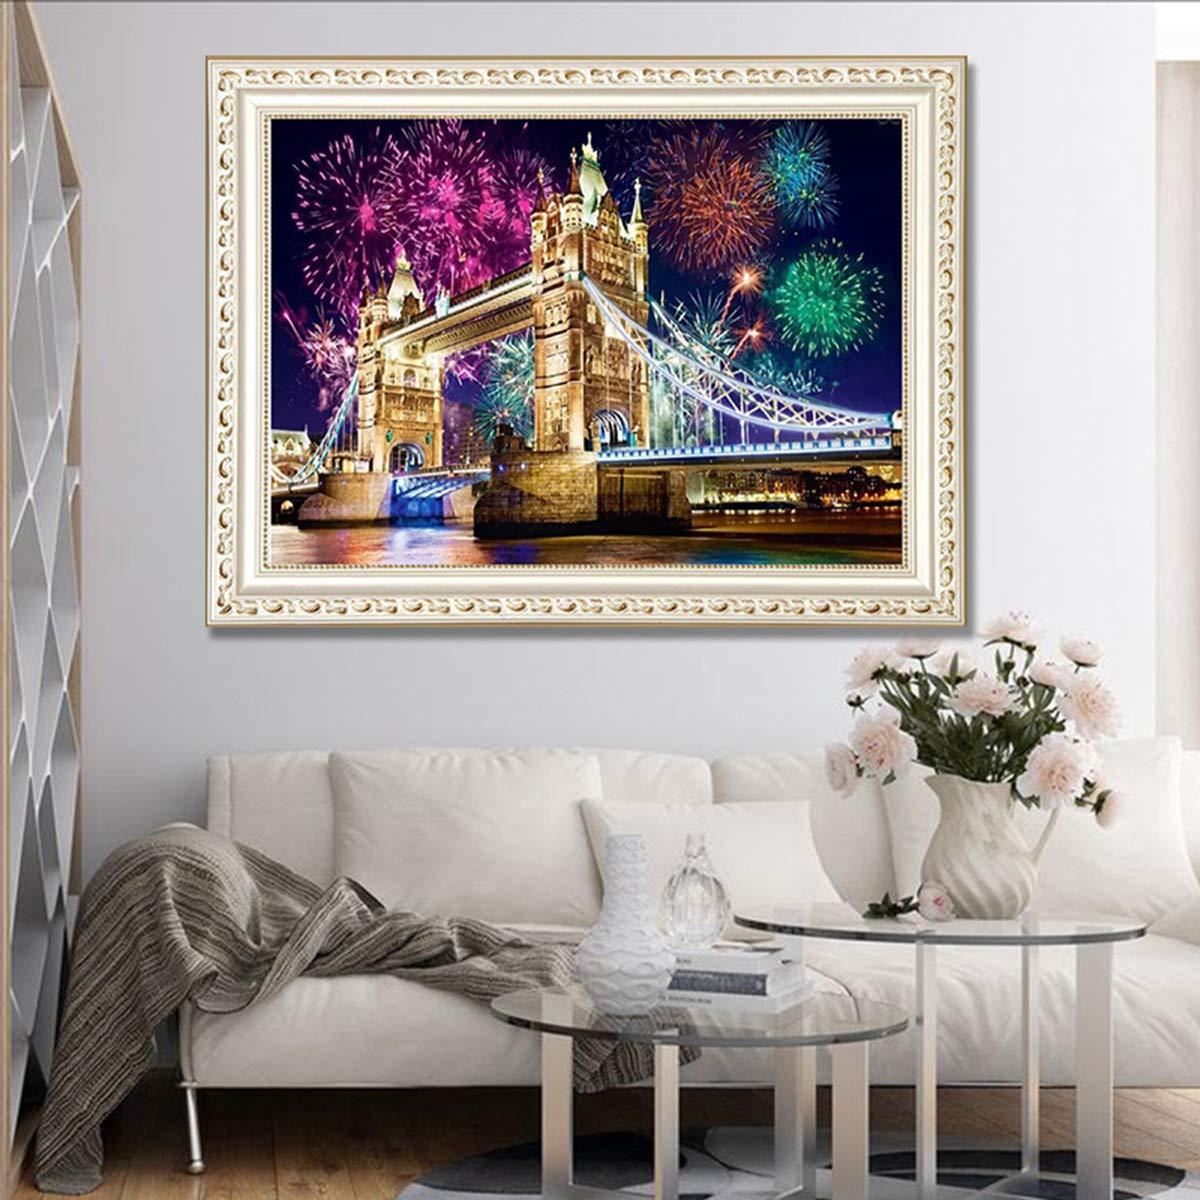 London Tower Bridge, 40x30CM Crystal Rhinestone Diamond Embroidery Paintings Arts Craft Home Wall Decor DIY 5D Full Drill Diamond Painting Kits for Adults Kids